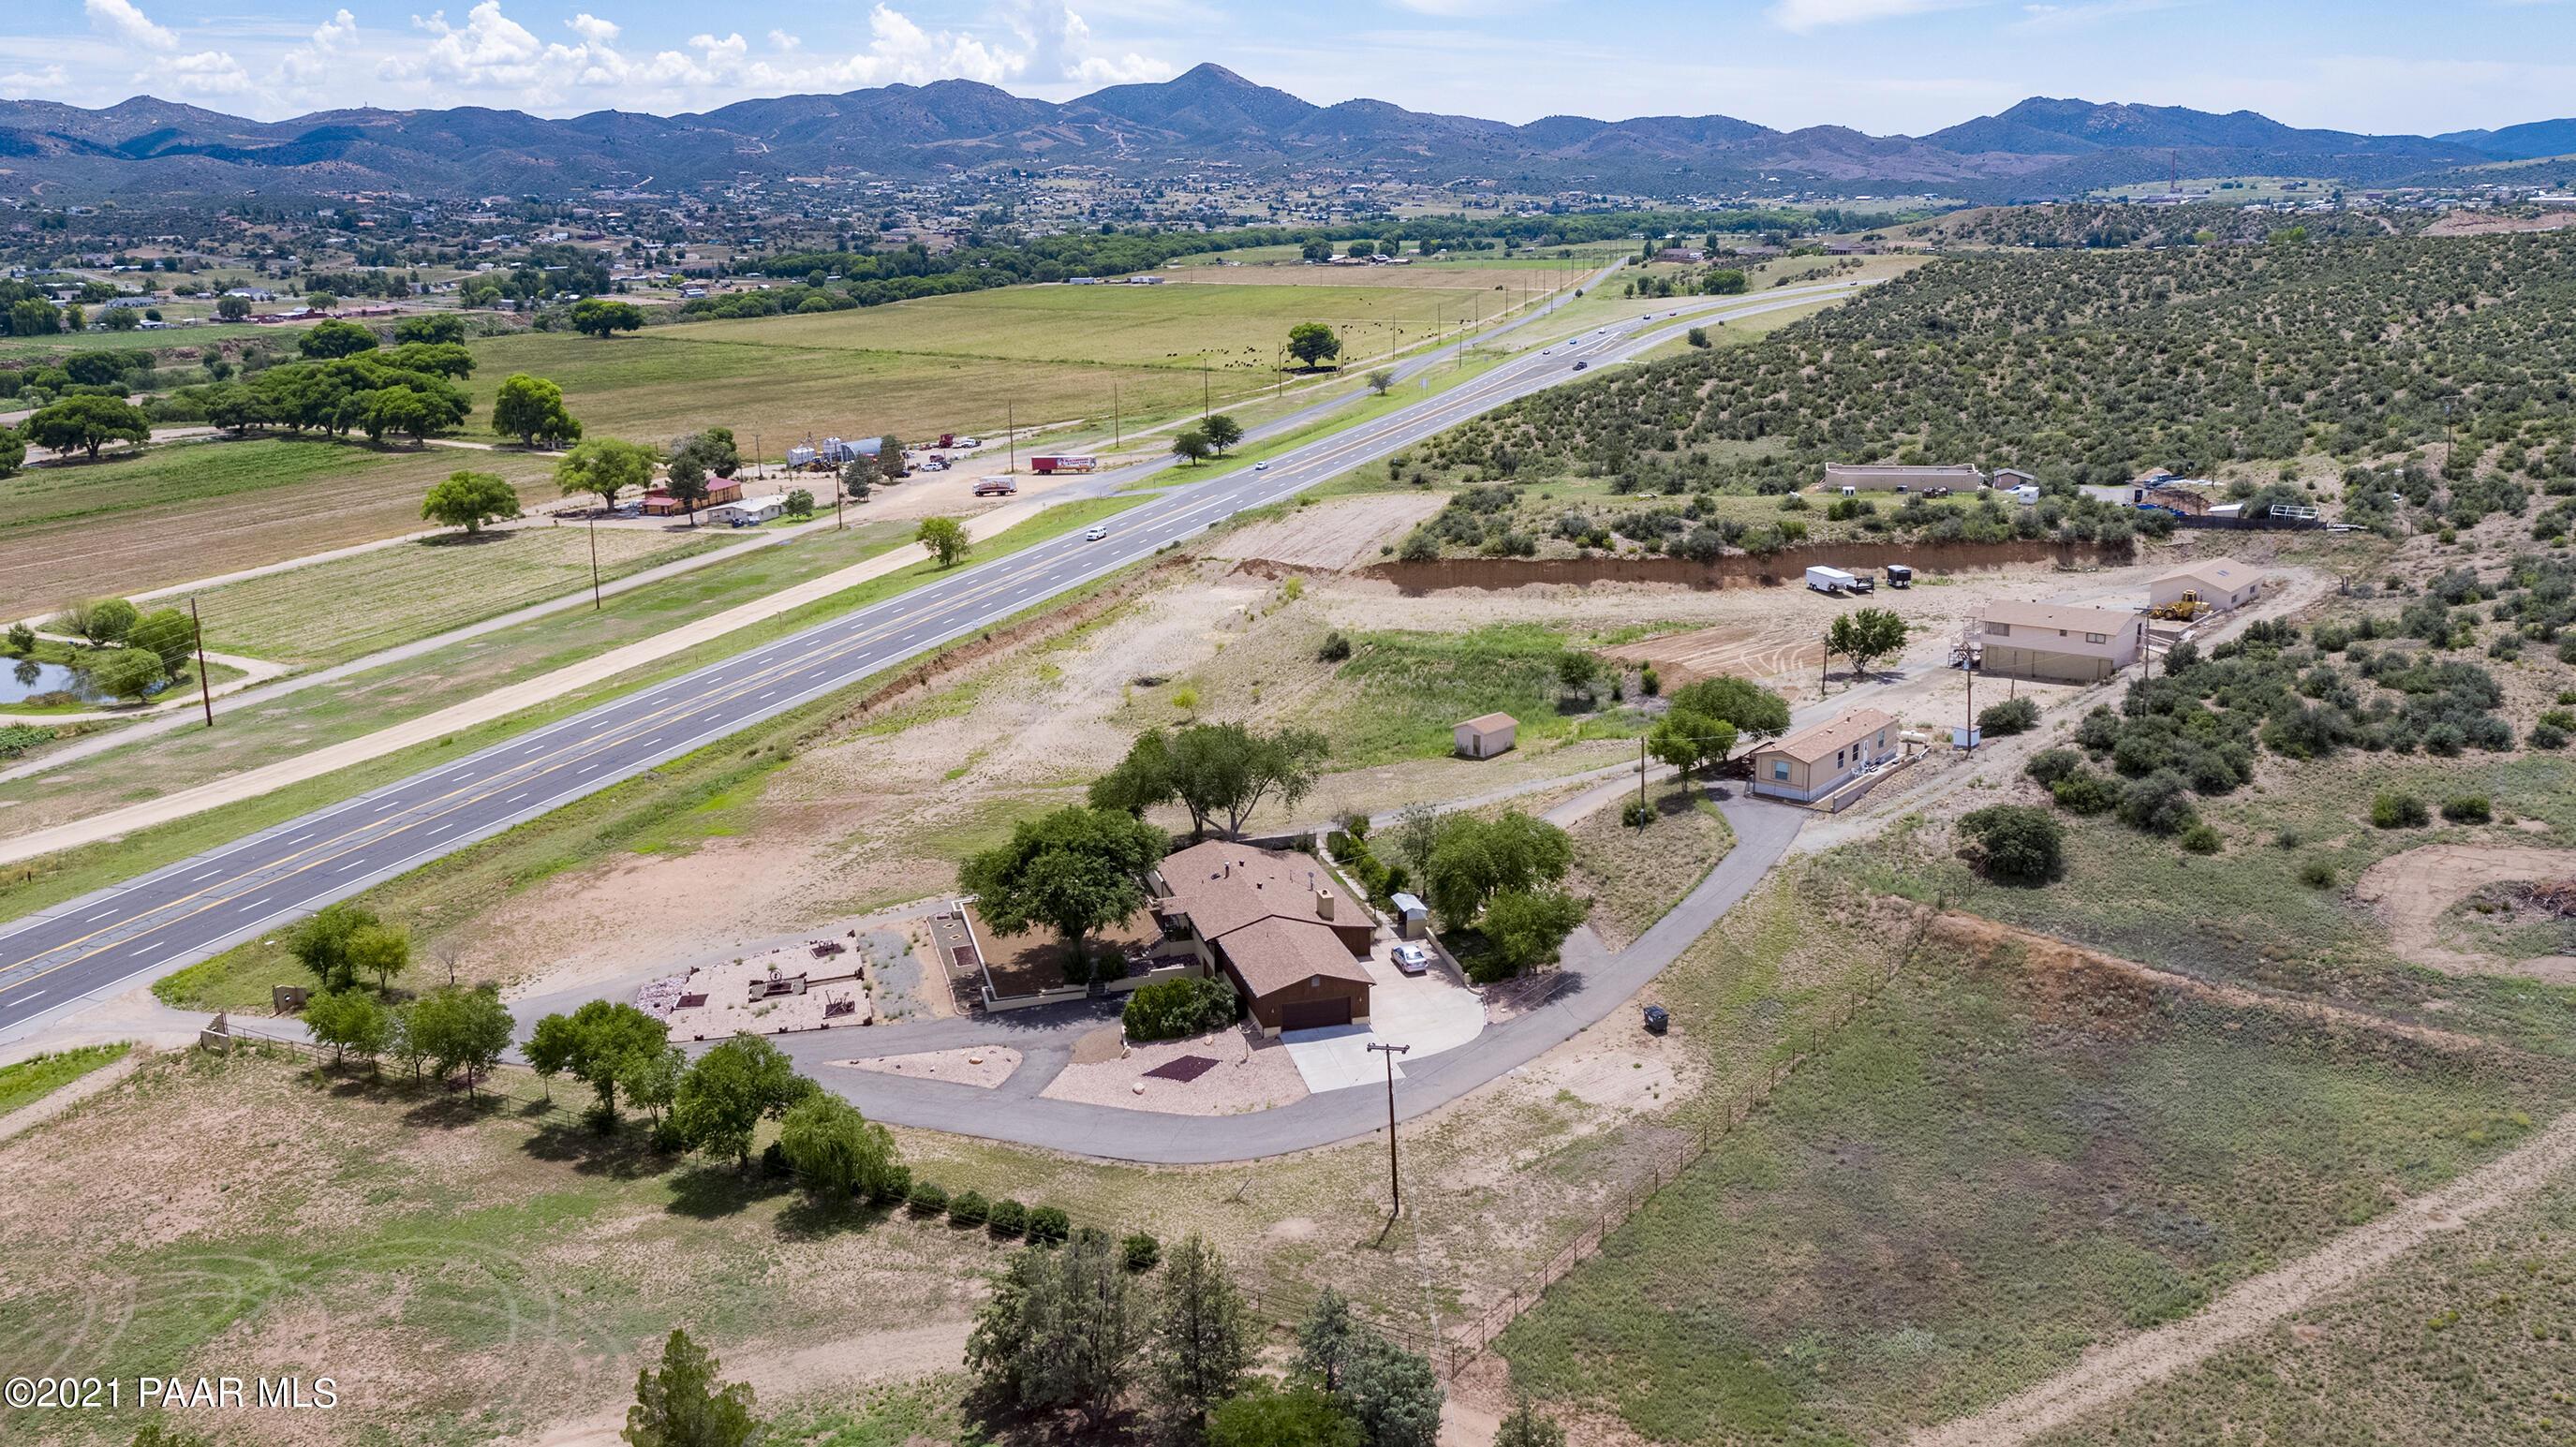 1084 S State Route 69, Dewey-Humboldt, AZ 86327